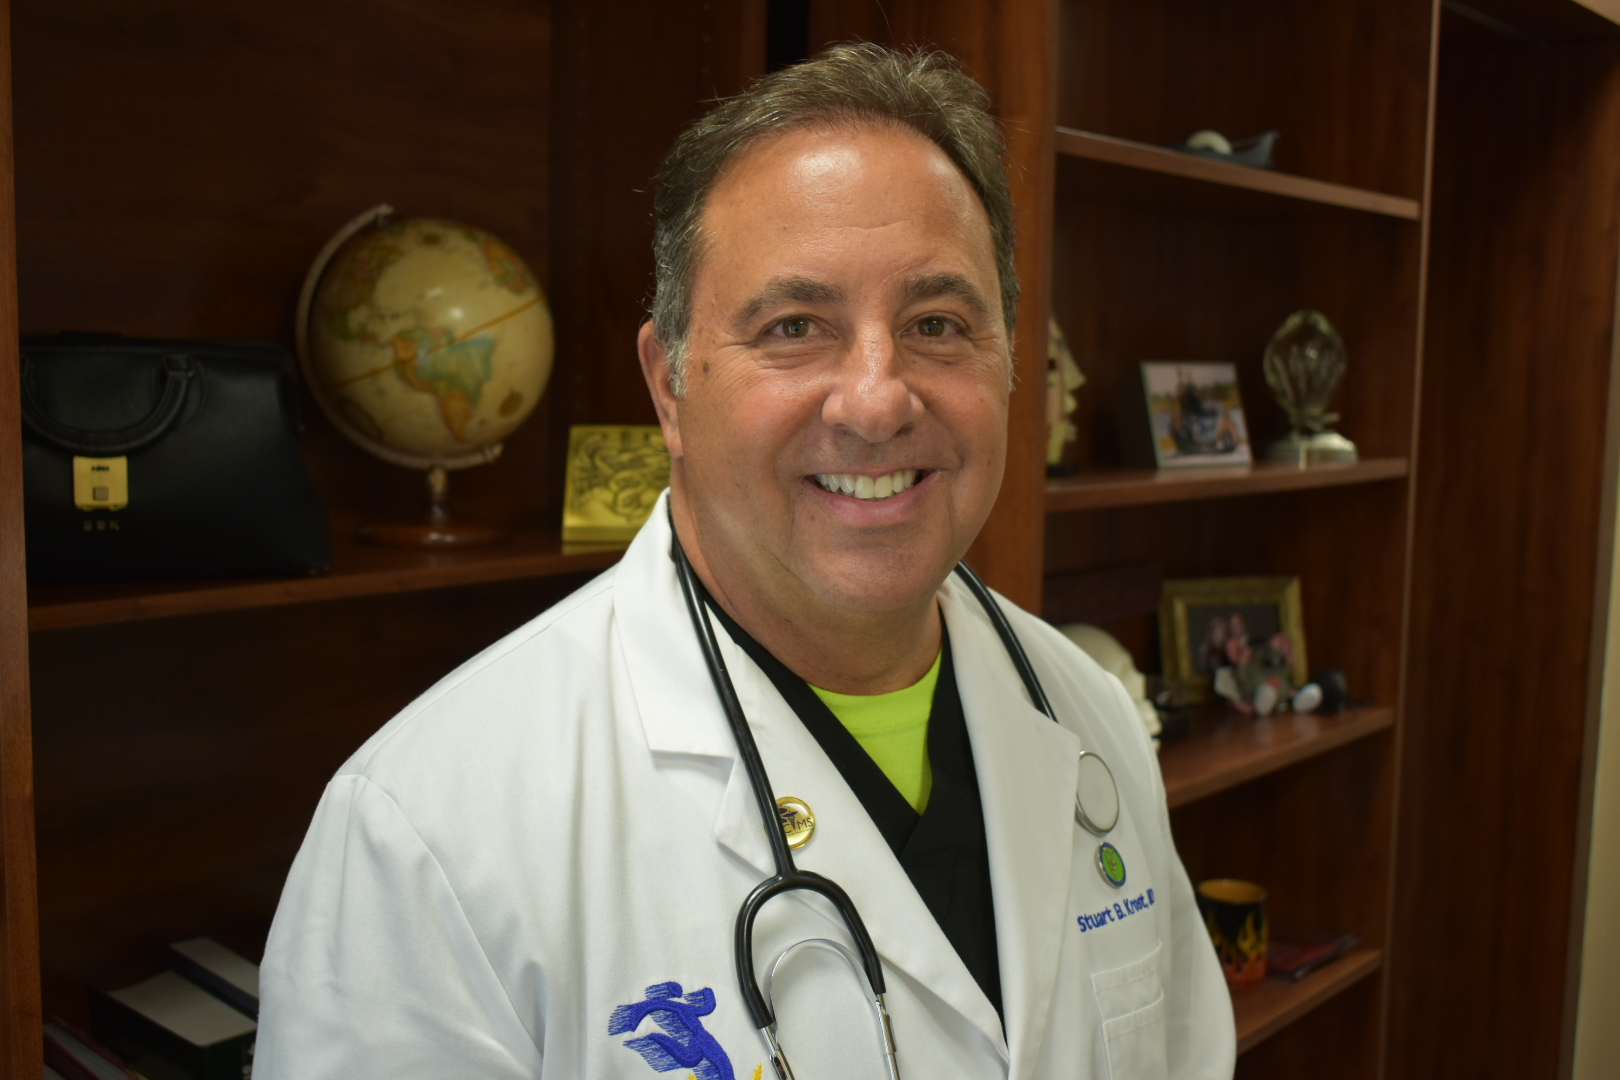 dr.krost